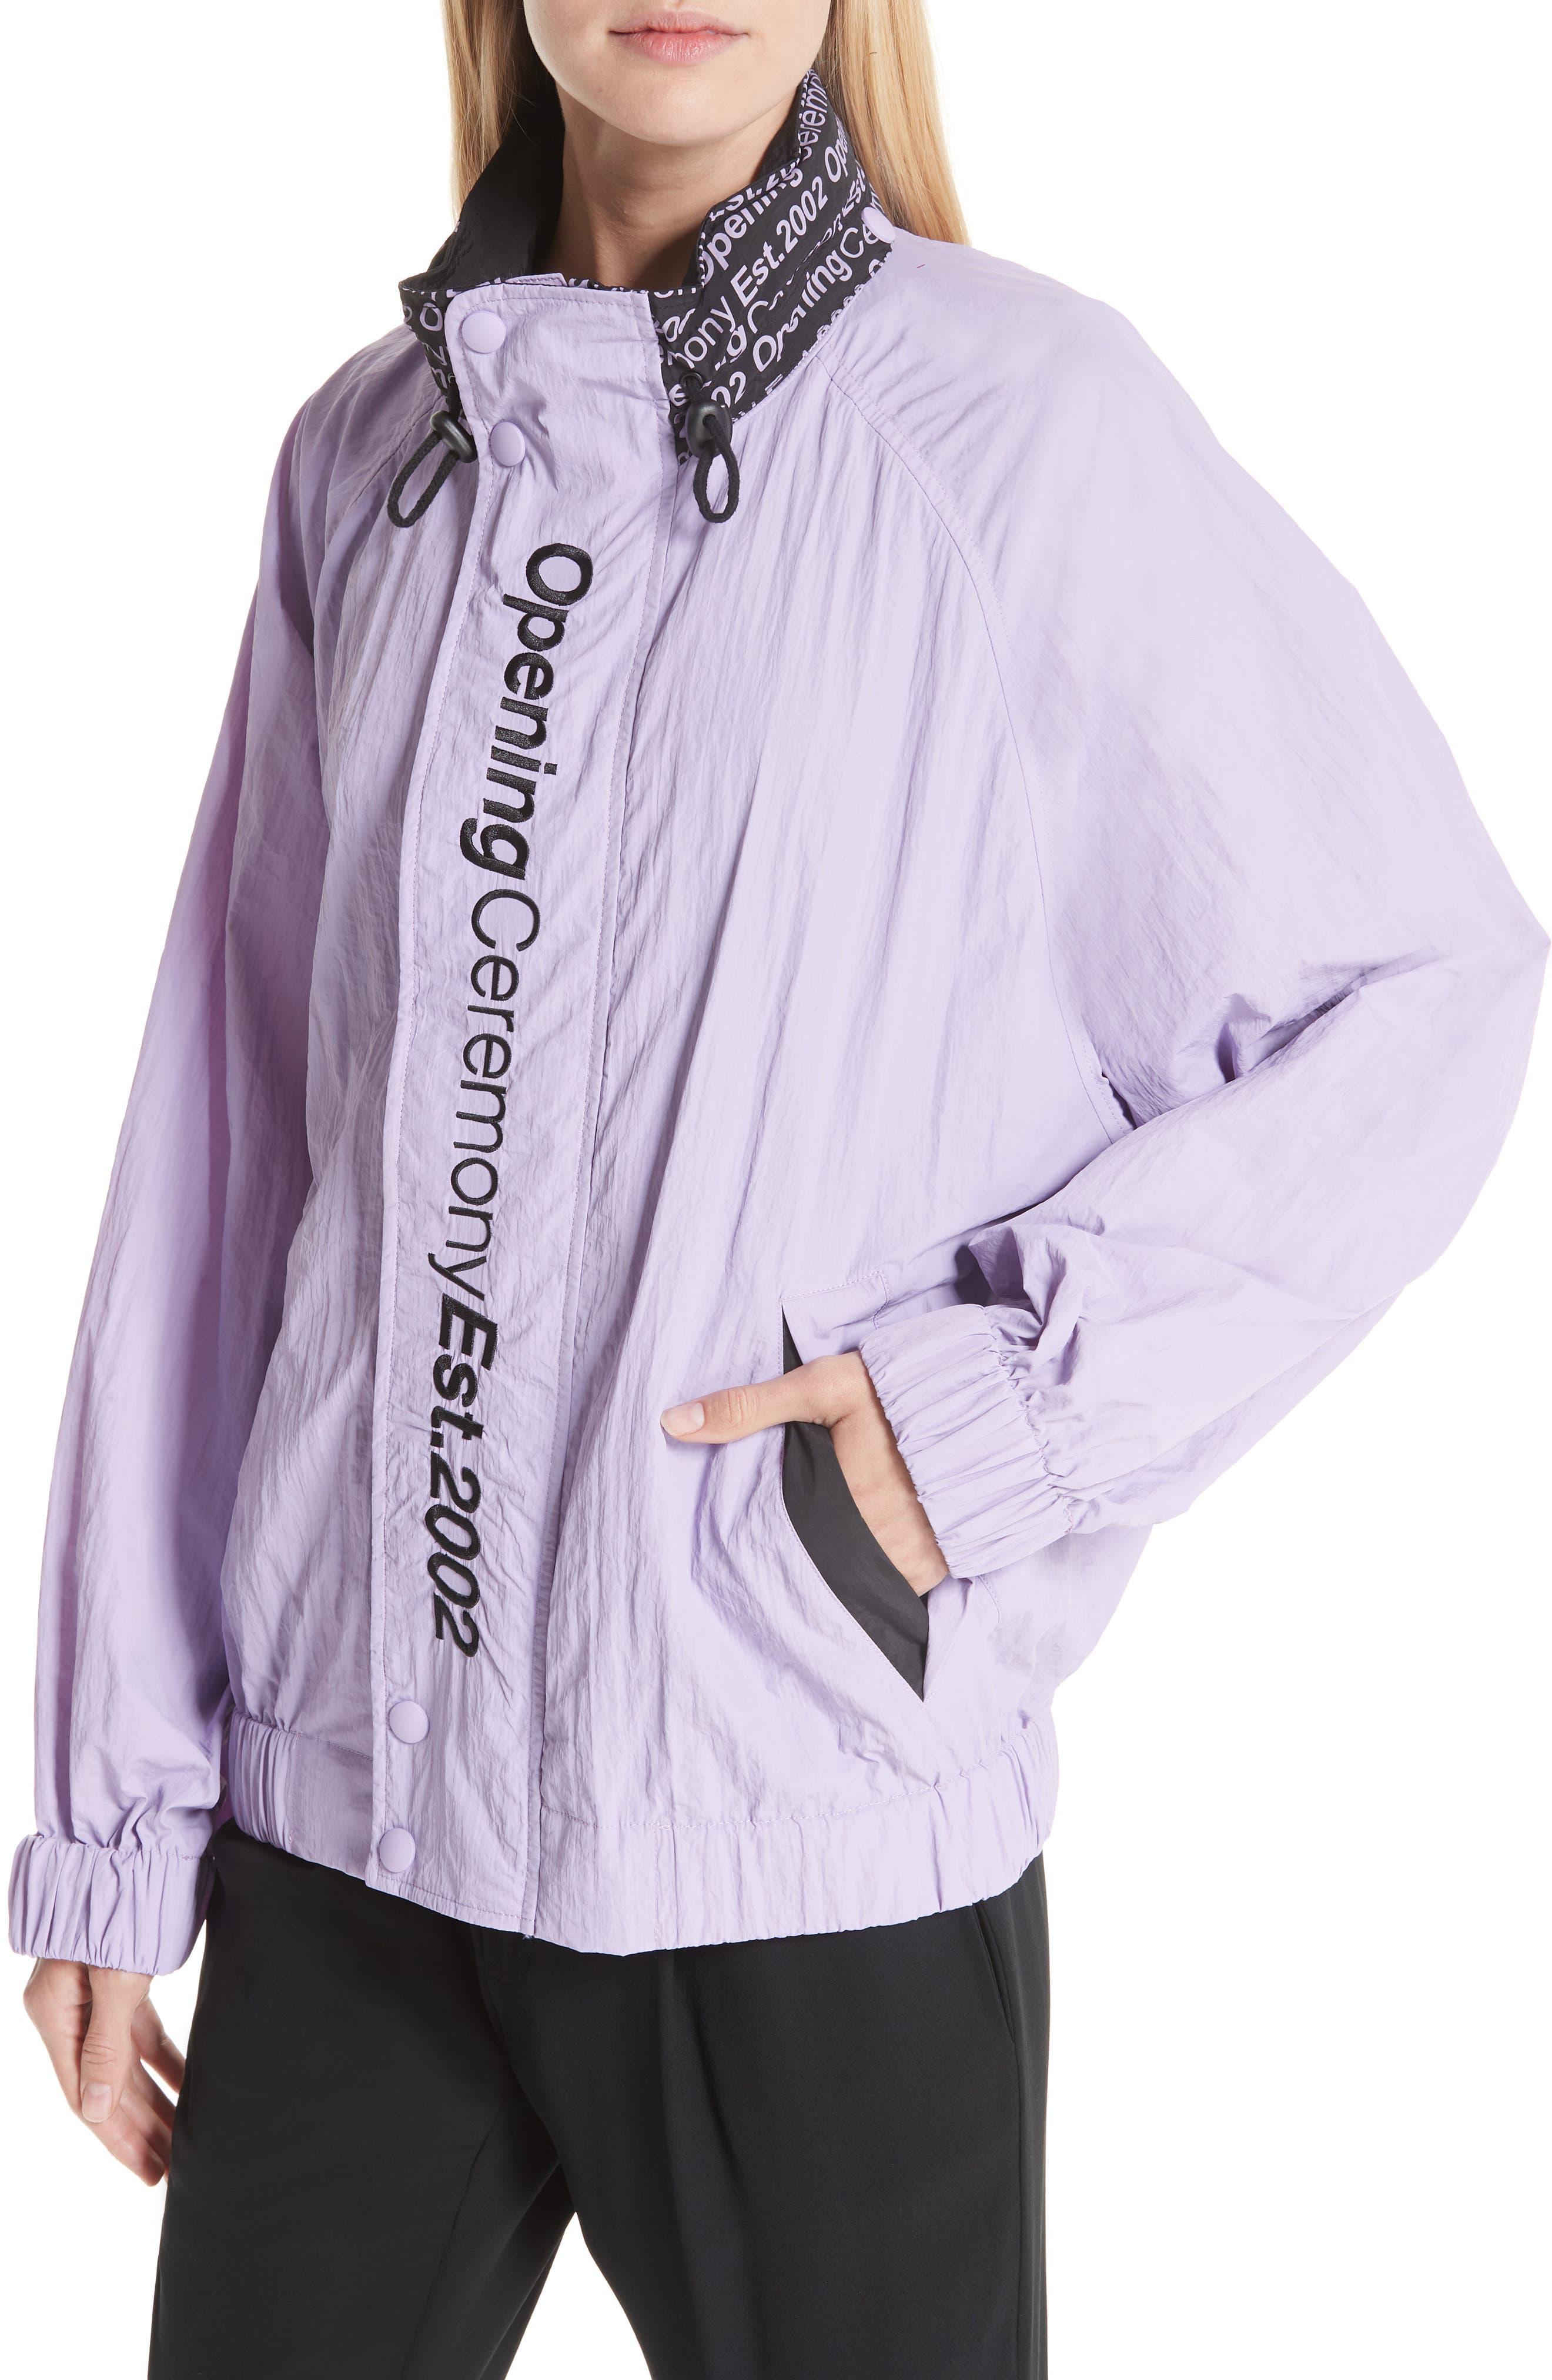 Crinkle Nylon Wind Jacket,                             Alternate thumbnail 4, color,                             531